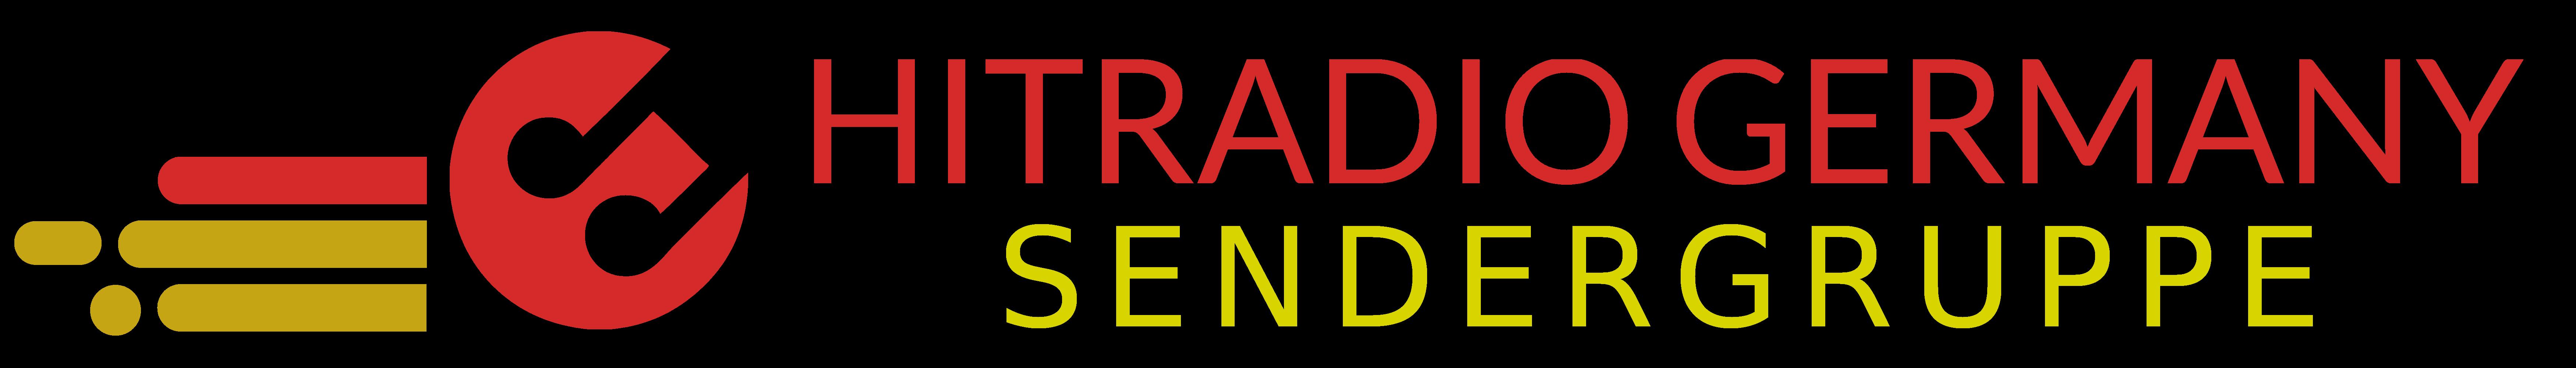 Hitradio Germany Sendergruppe